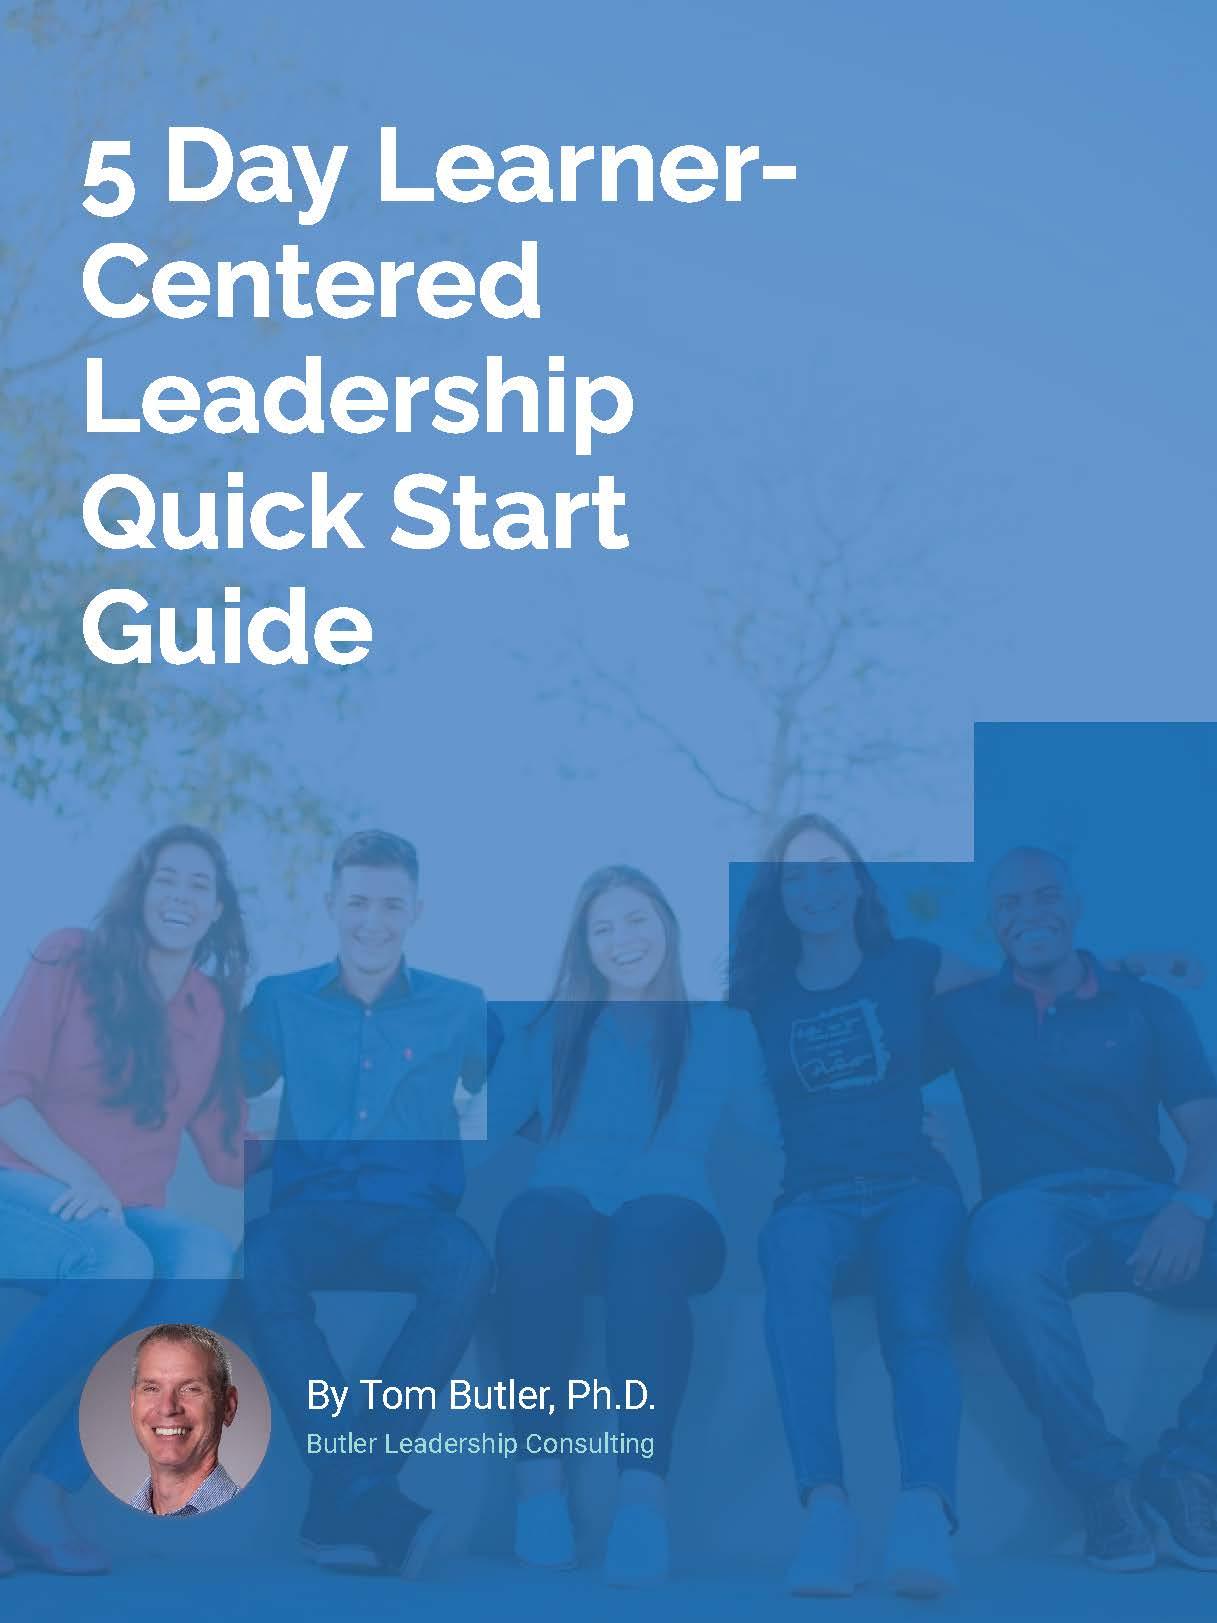 5 Day Learner-Centered leader Kickstart Workbook